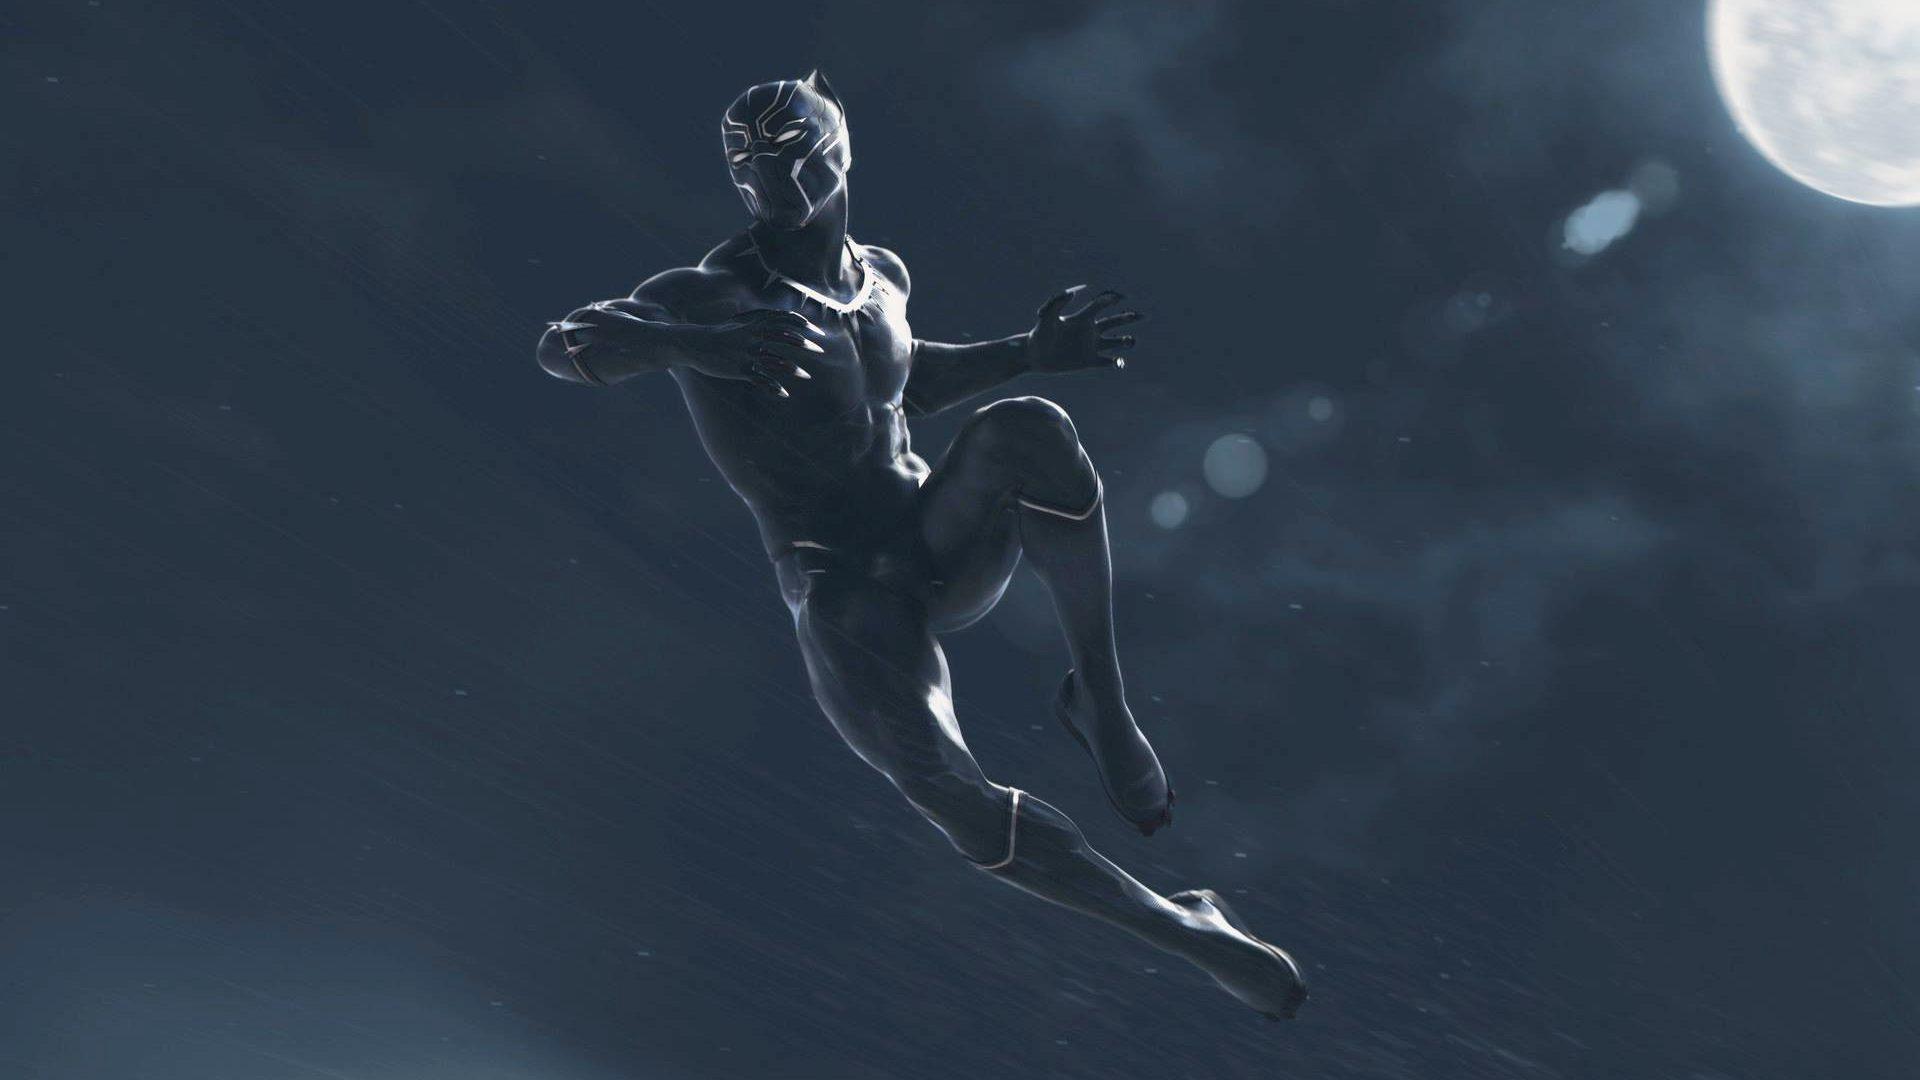 Superhero Black Panther Wallpapers 1920x1080